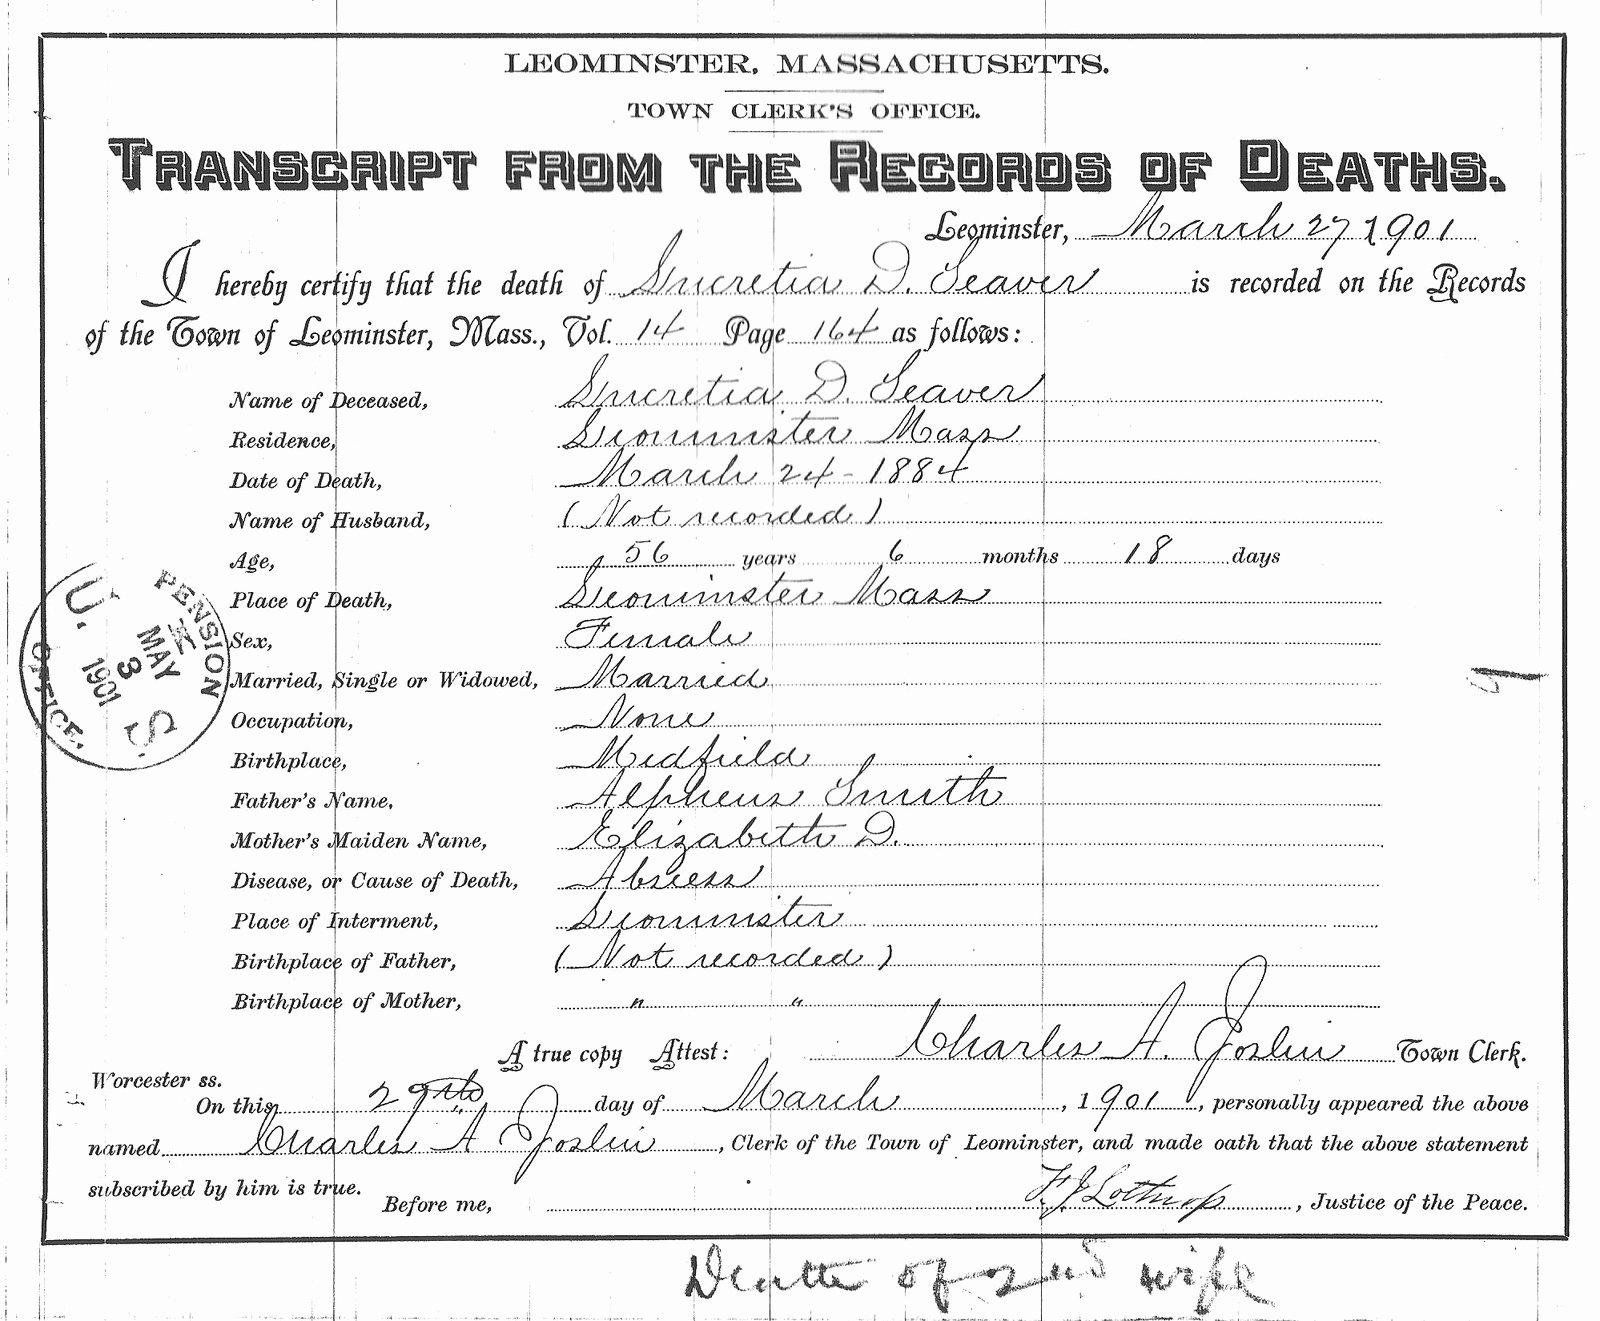 Blank Death Certificate Template Unique Best S Of Blank Death Certificate Georgia Blank